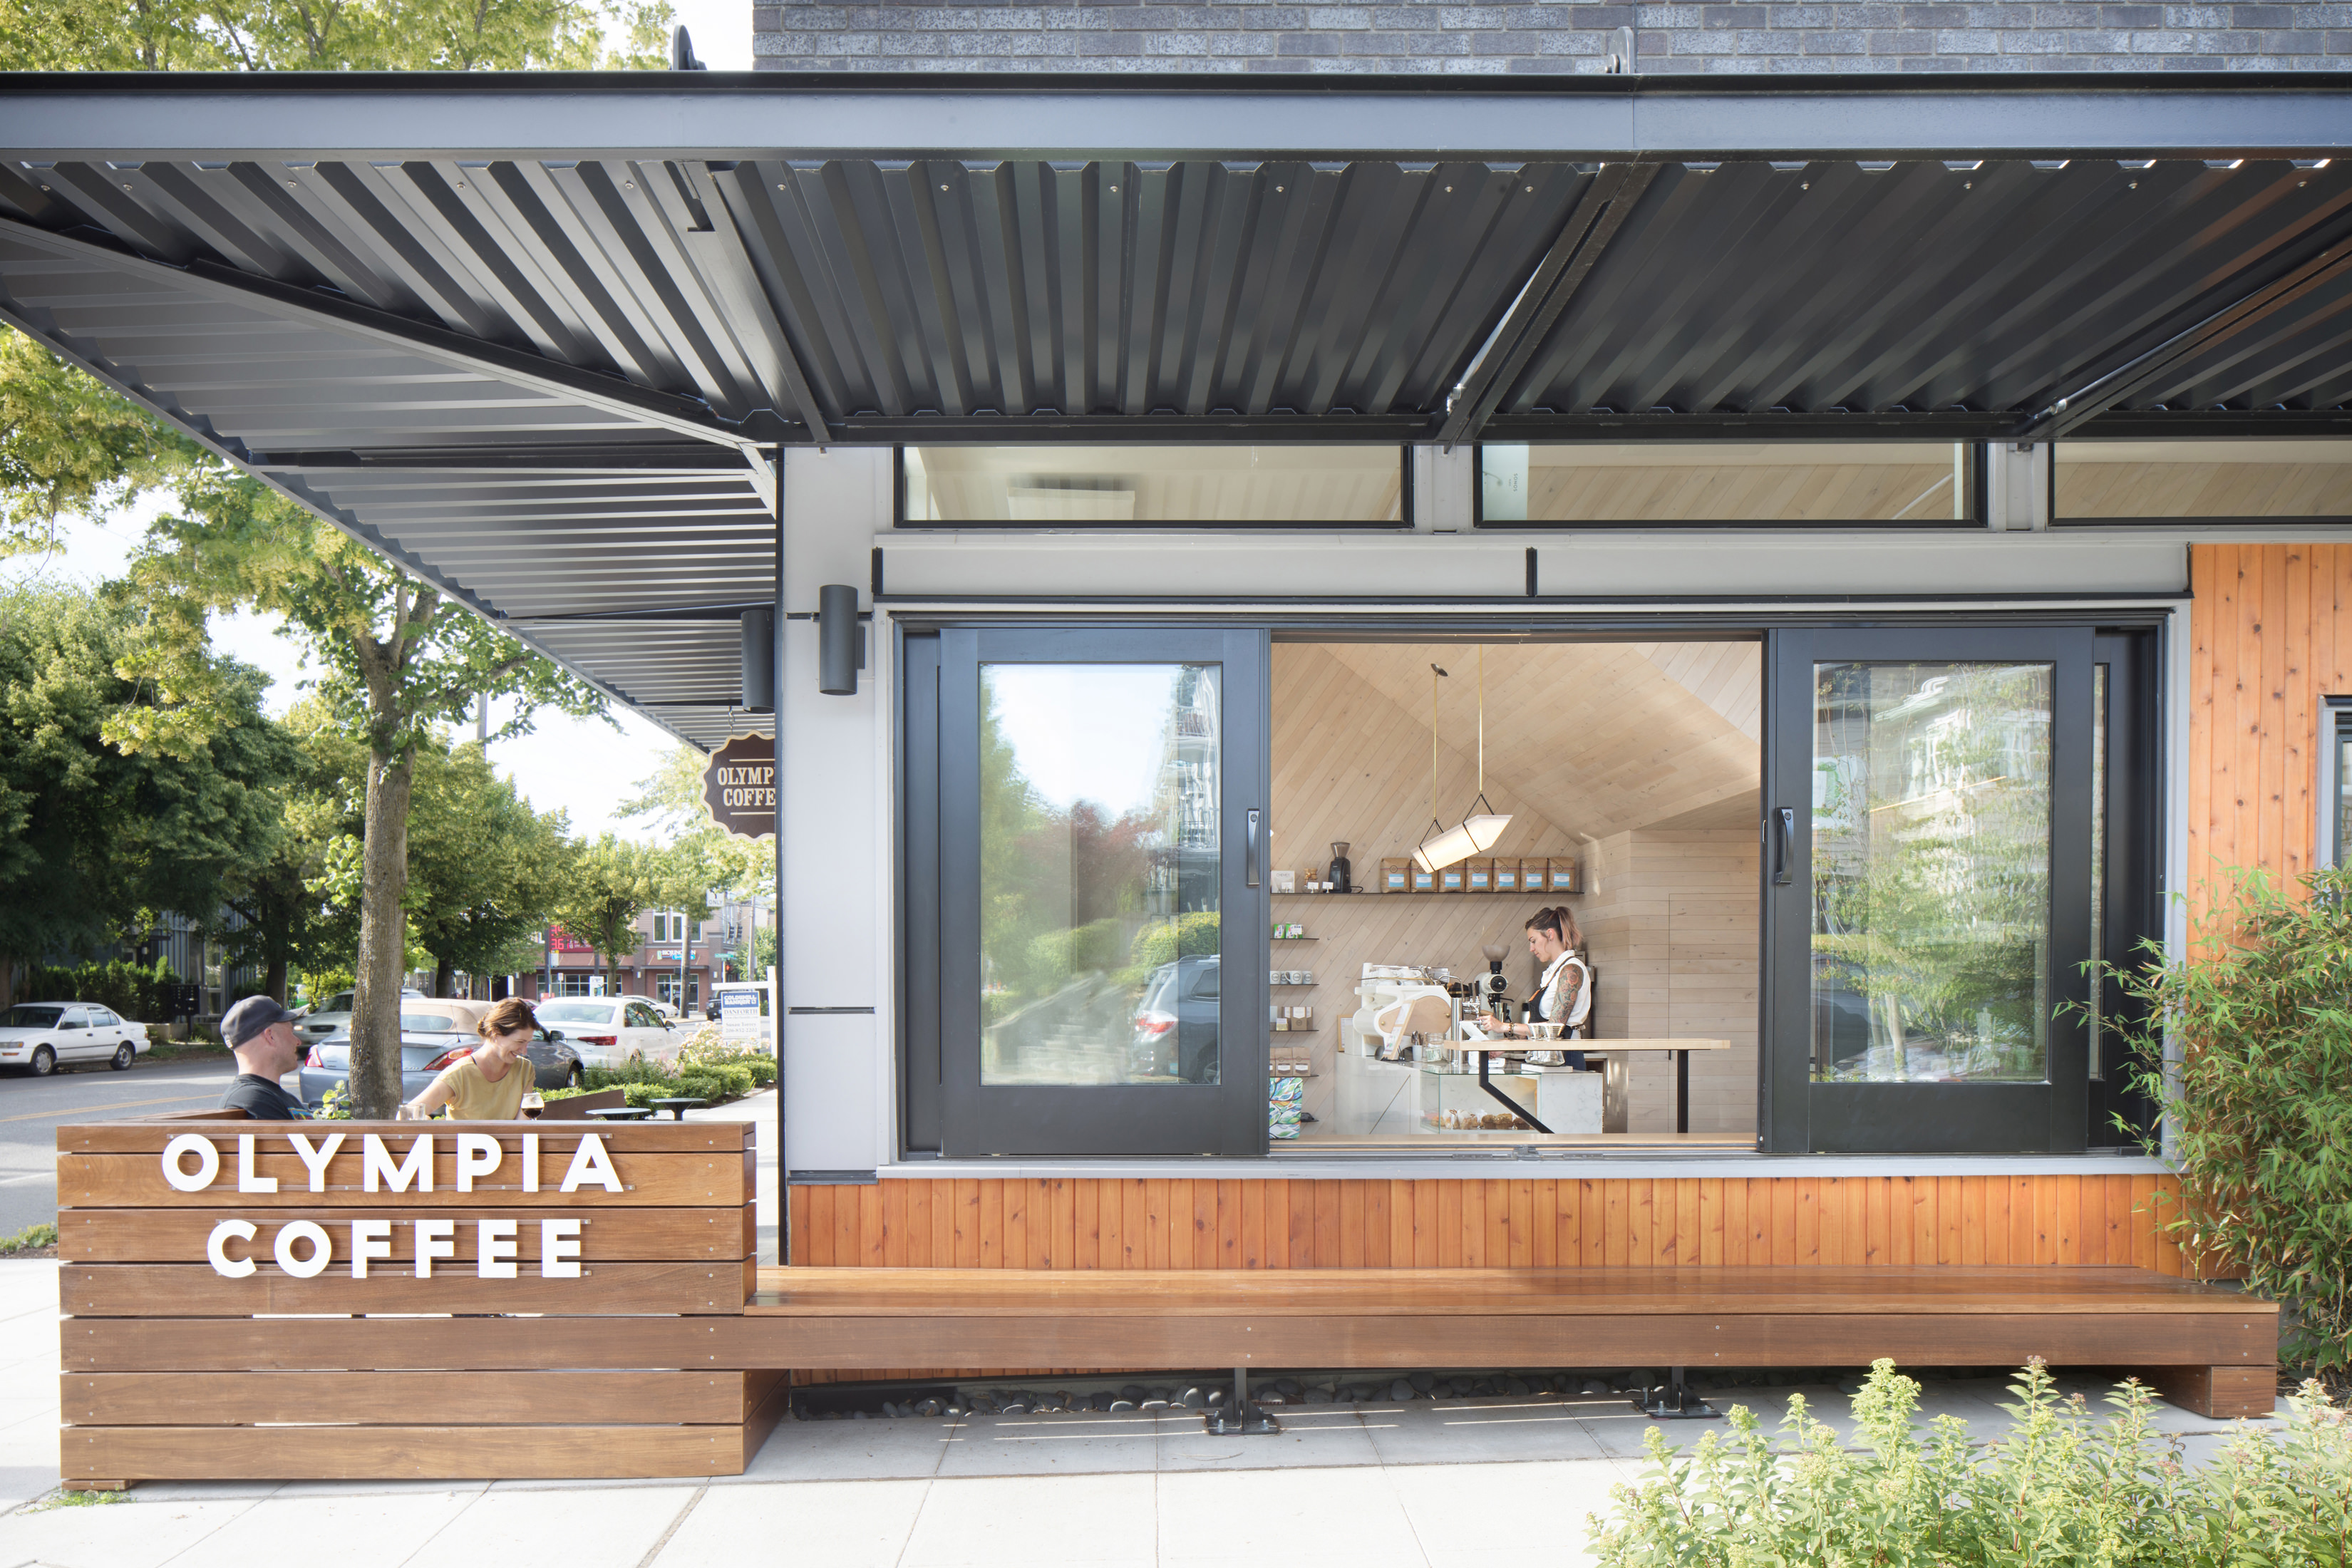 Olympia-Coffee-West-Seattle_Artisans-Gro